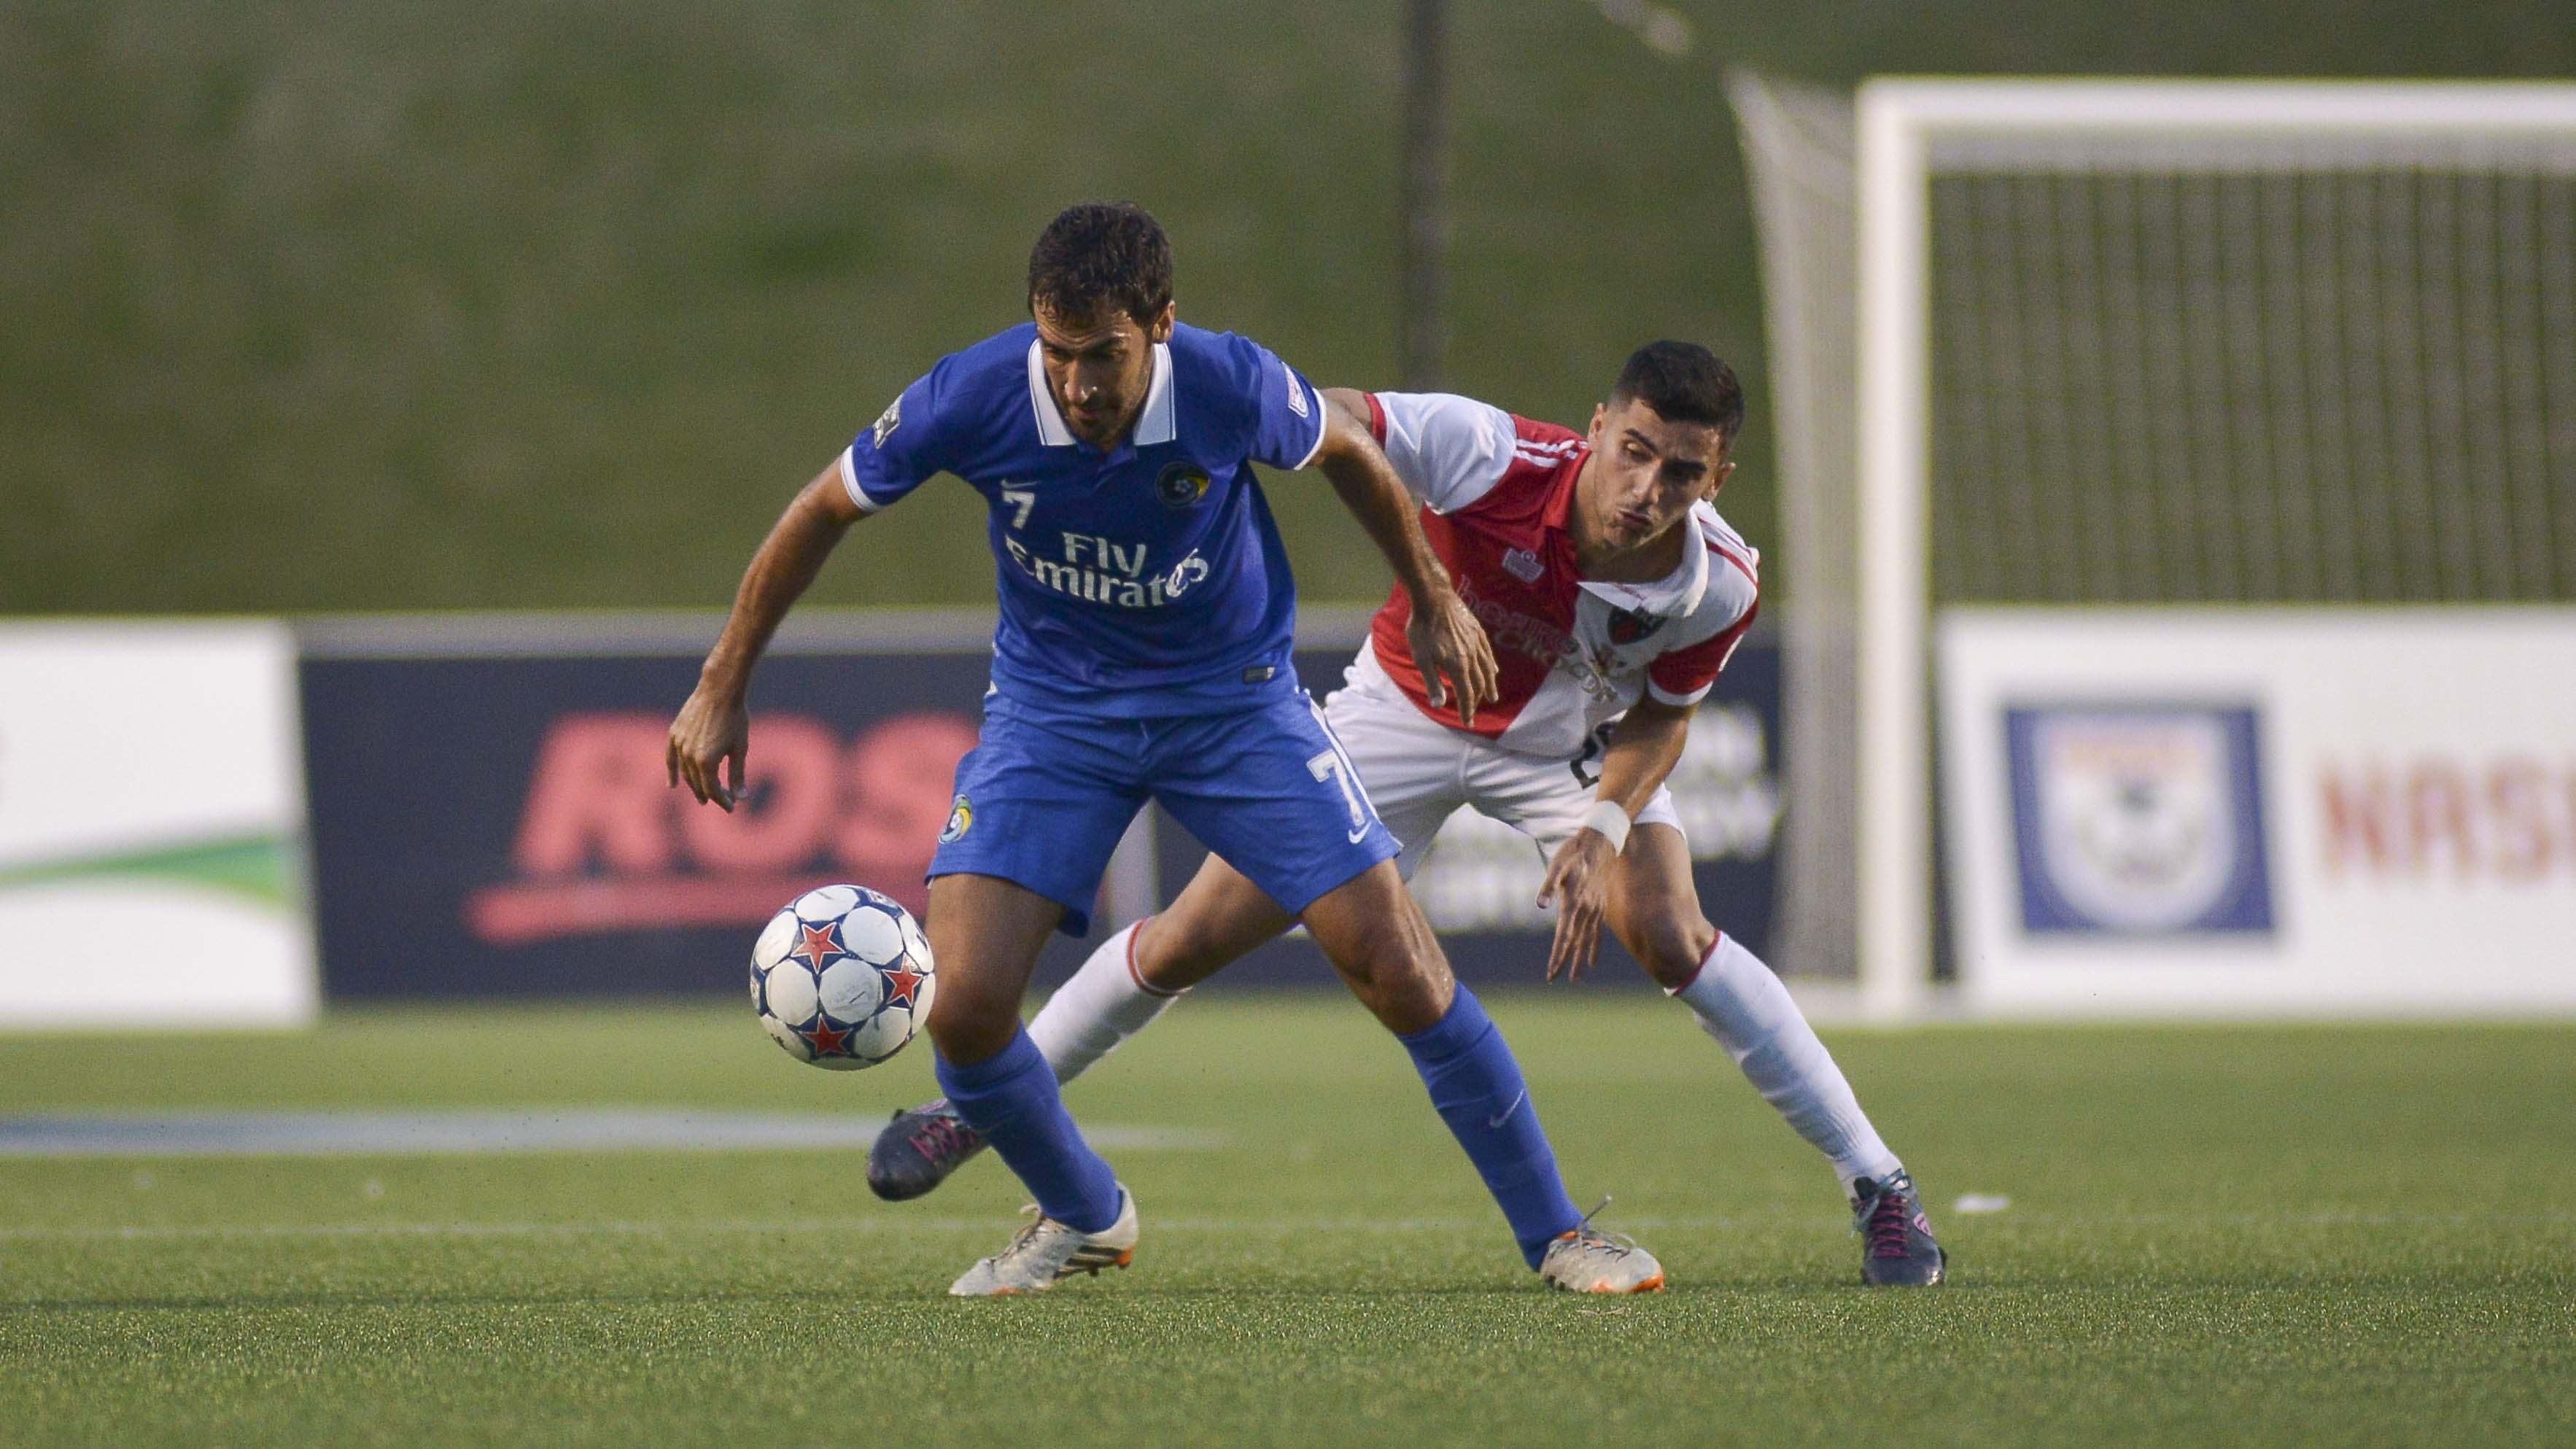 Soccer: NASL New York Cosmos at Ottawa Fury